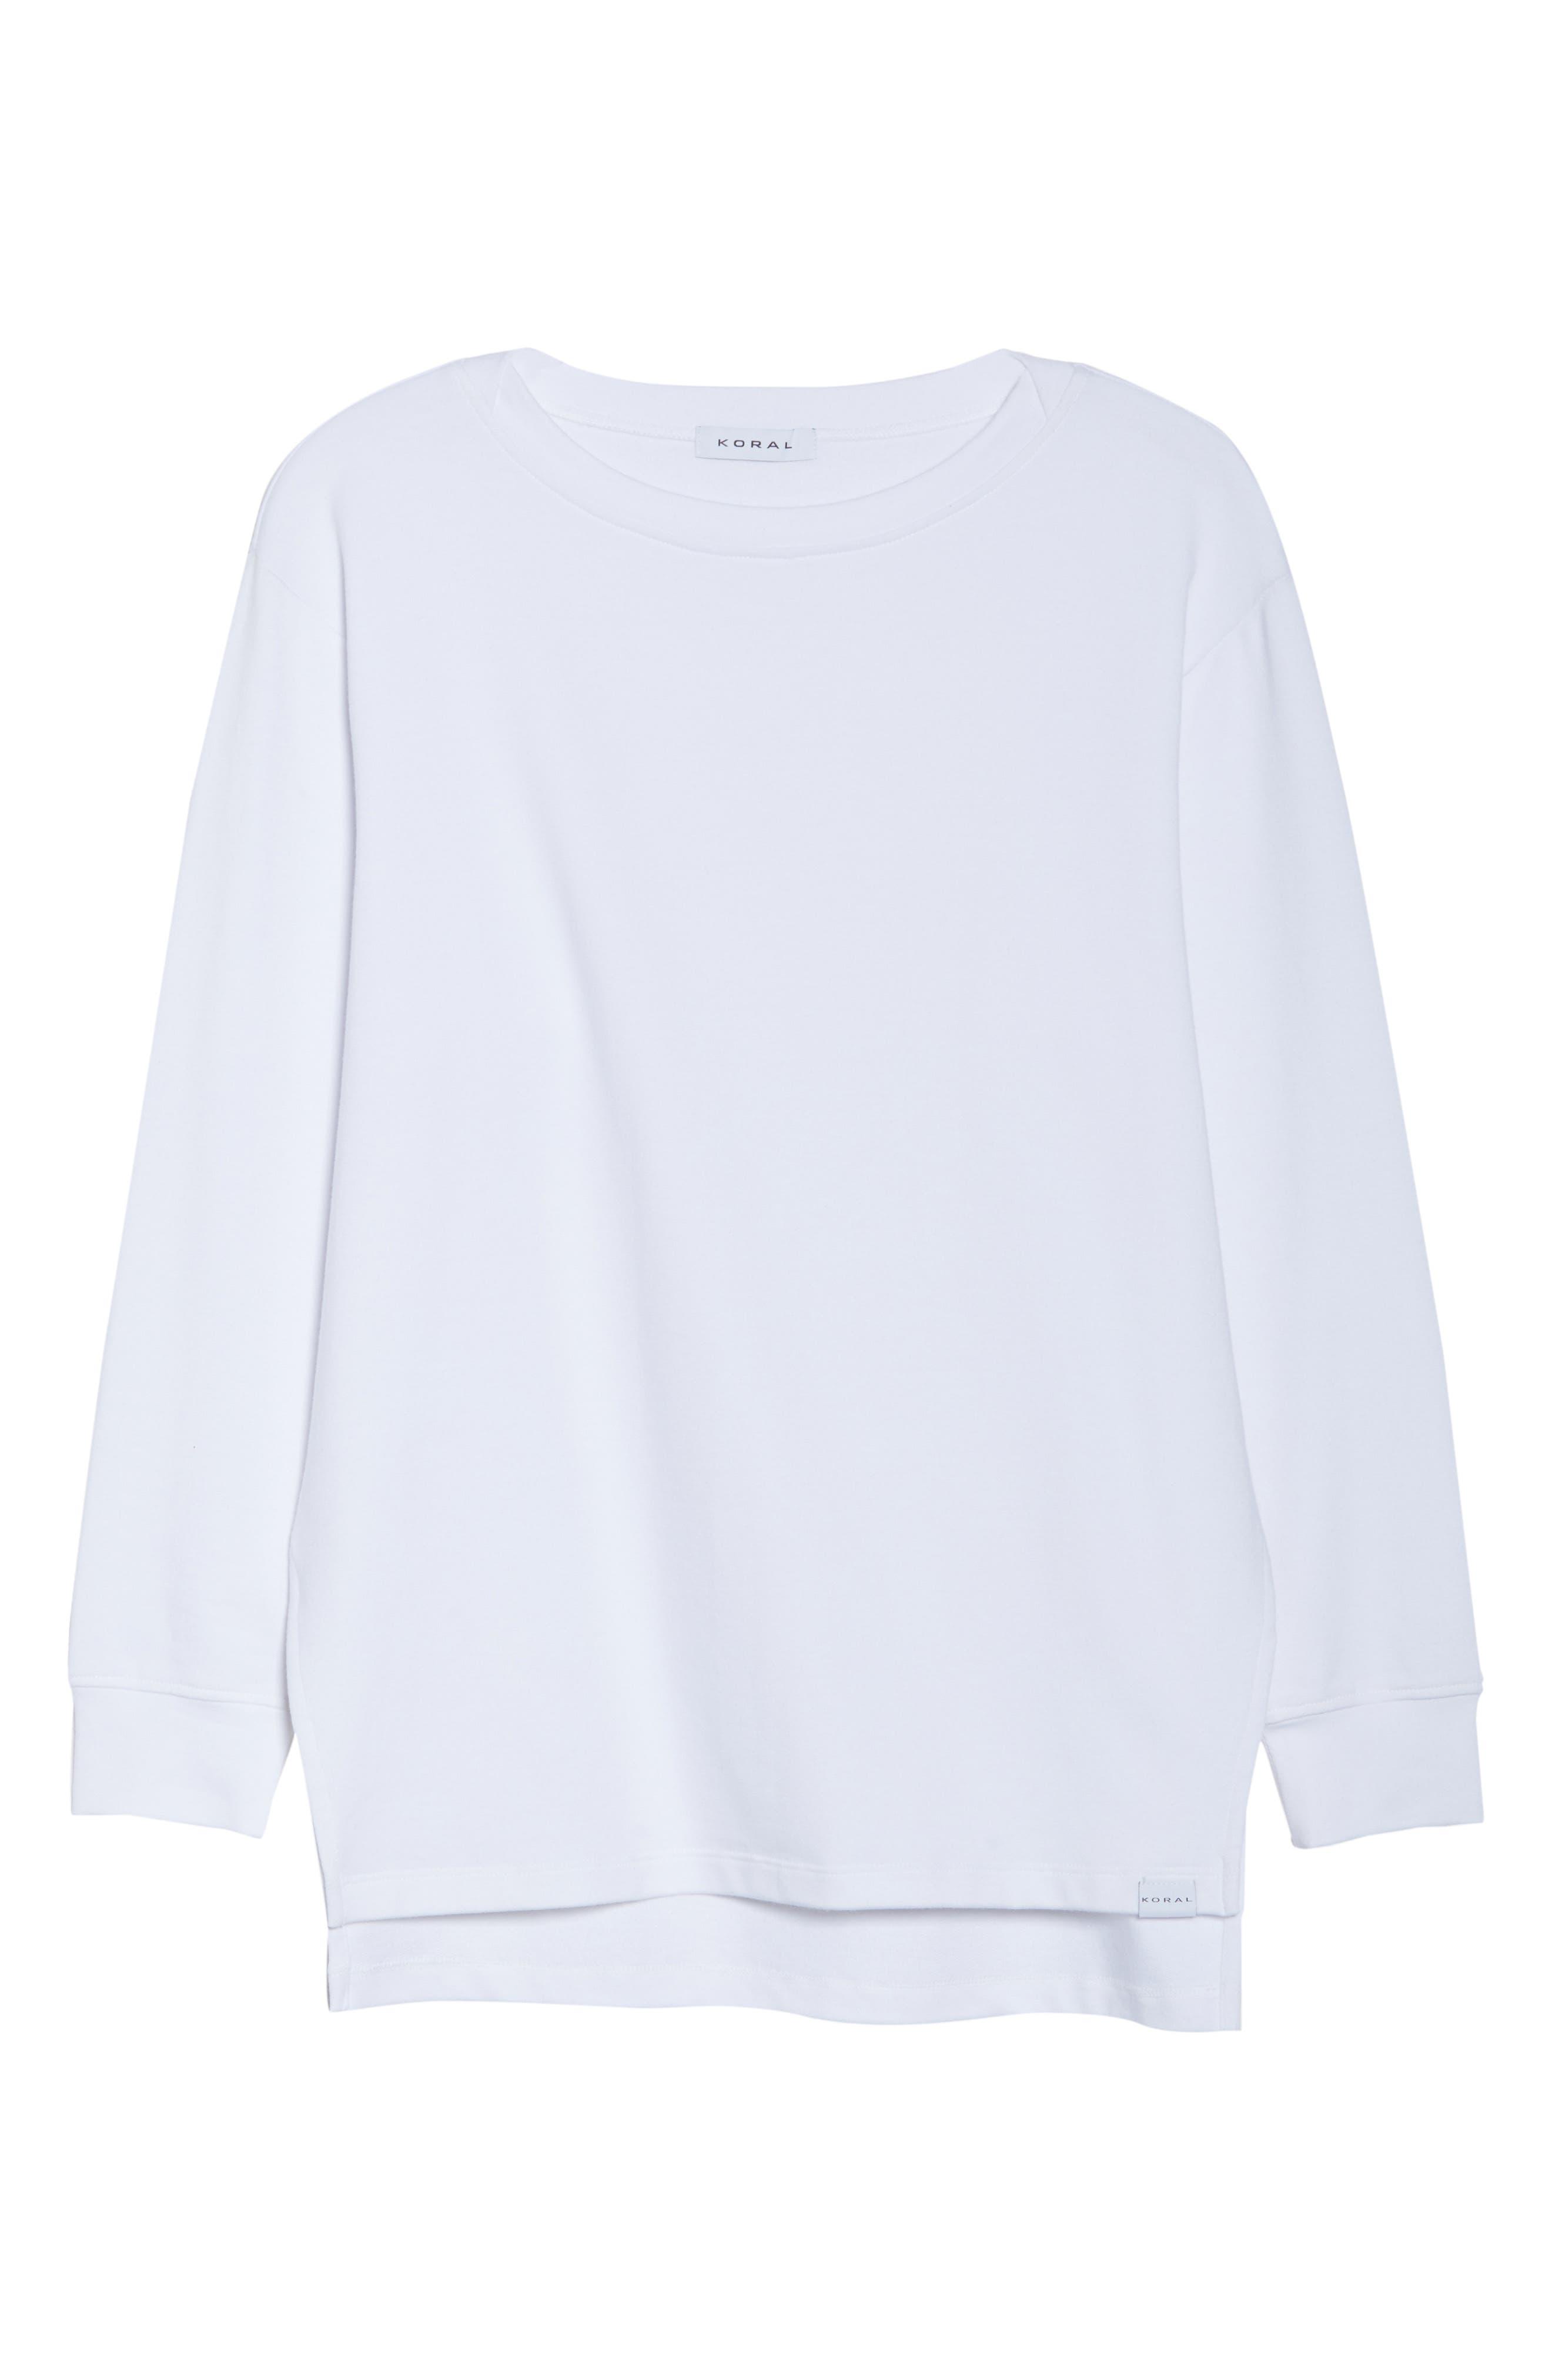 Bristol Pullover,                             Alternate thumbnail 7, color,                             WHITE/ BLACK